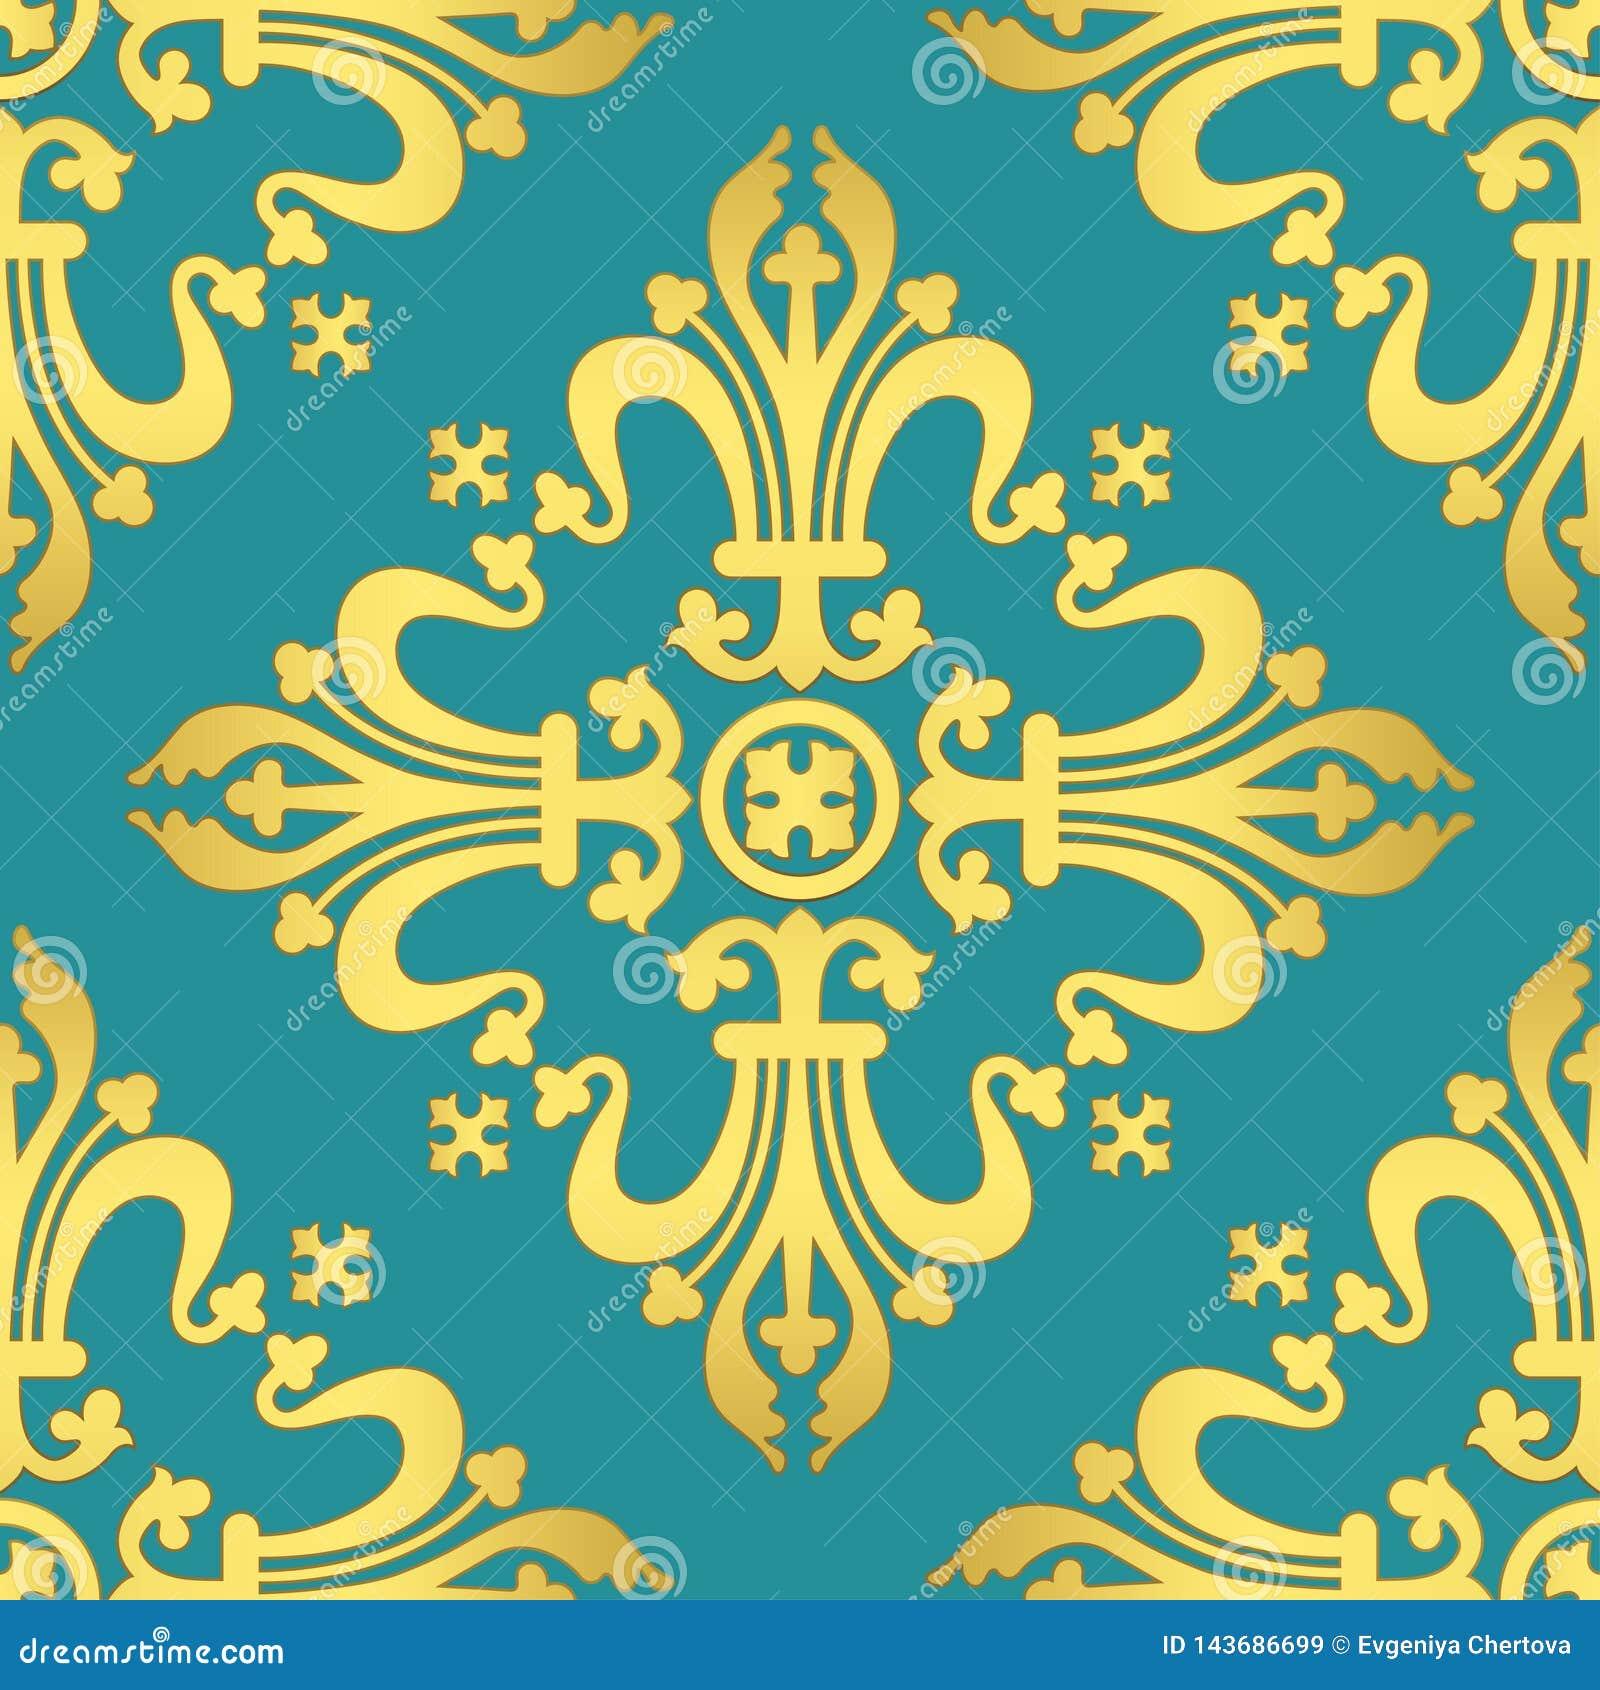 Vintage Baroque Ornament, Damask Floral Luxury Seamless